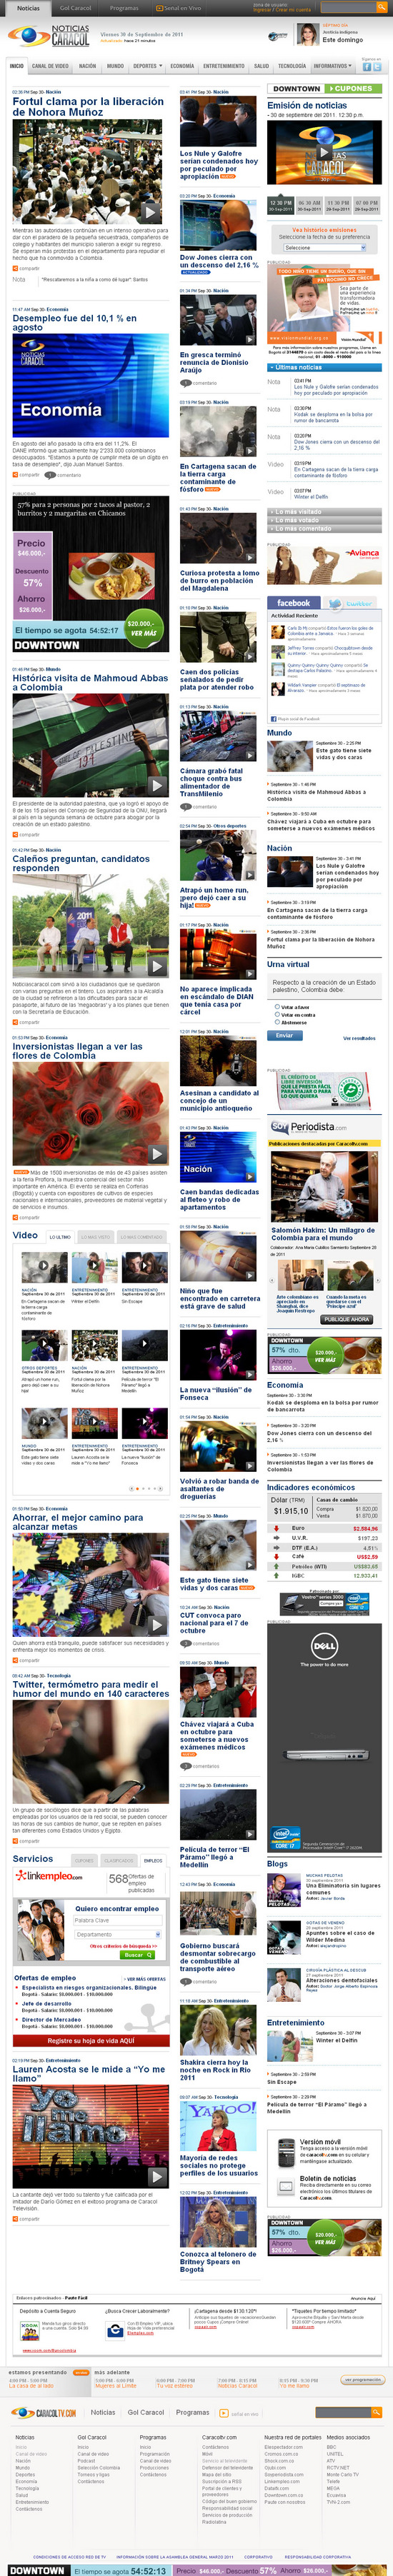 Vista de www.caracoltv.com | Pagina Web o Home